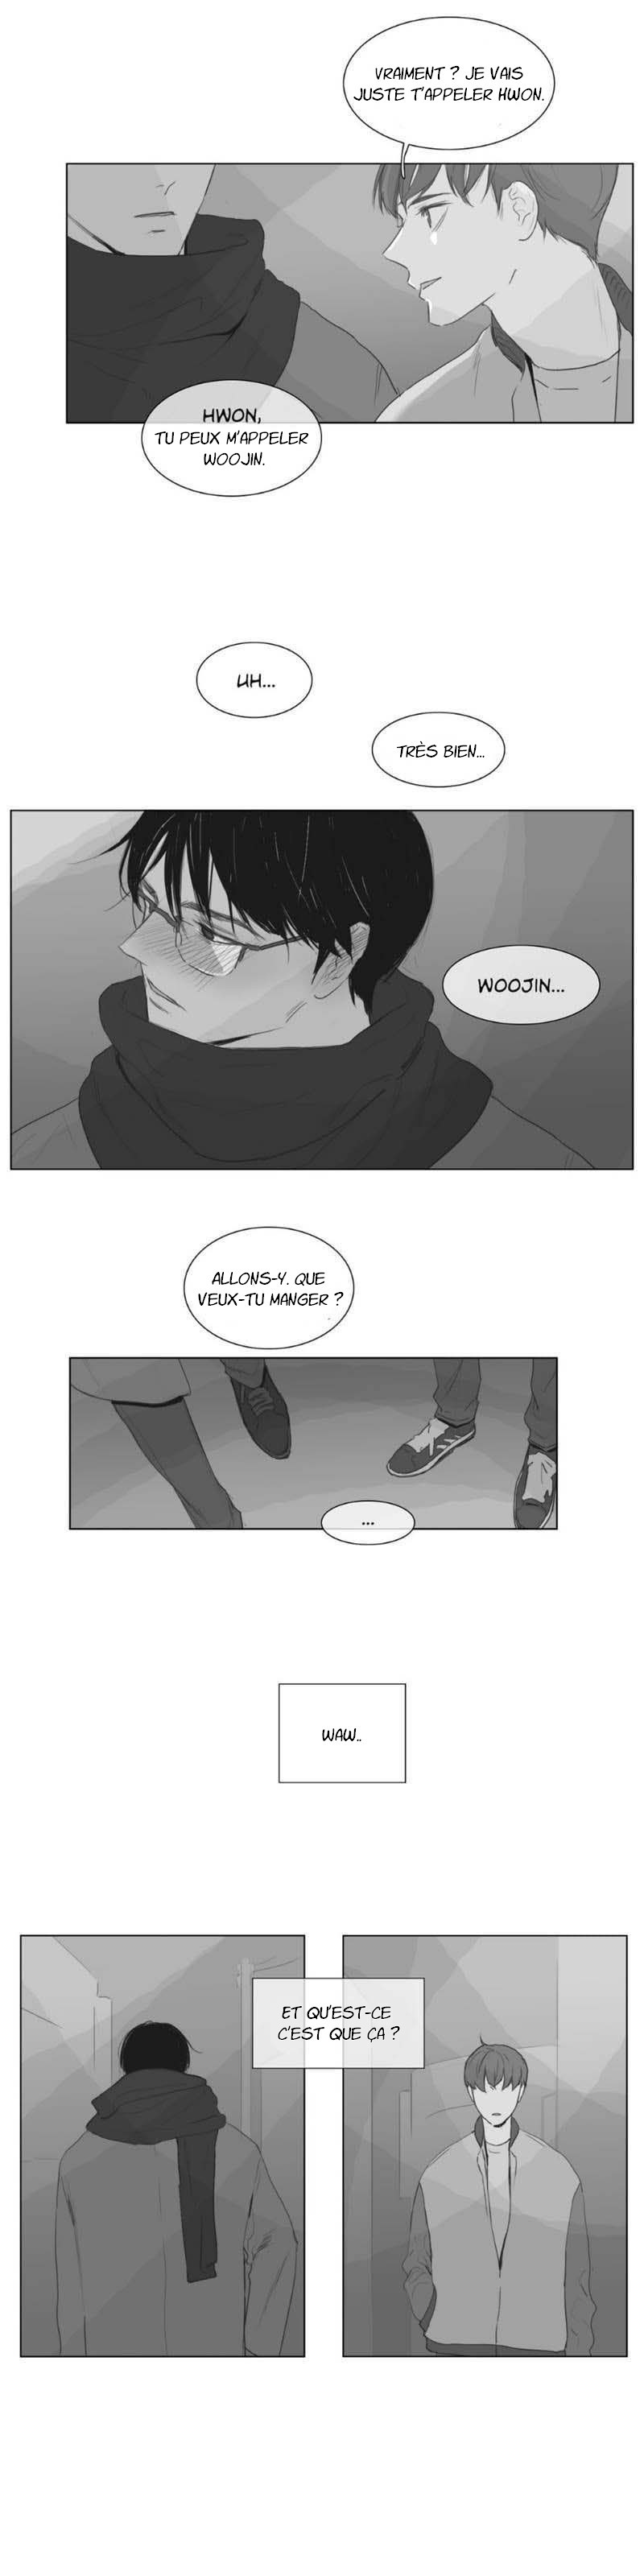 https://nine.mangadogs.com/fr_manga/pic2/8/11400/510753/EscapeintoObliviousChapitr_14_165.jpg Page 15